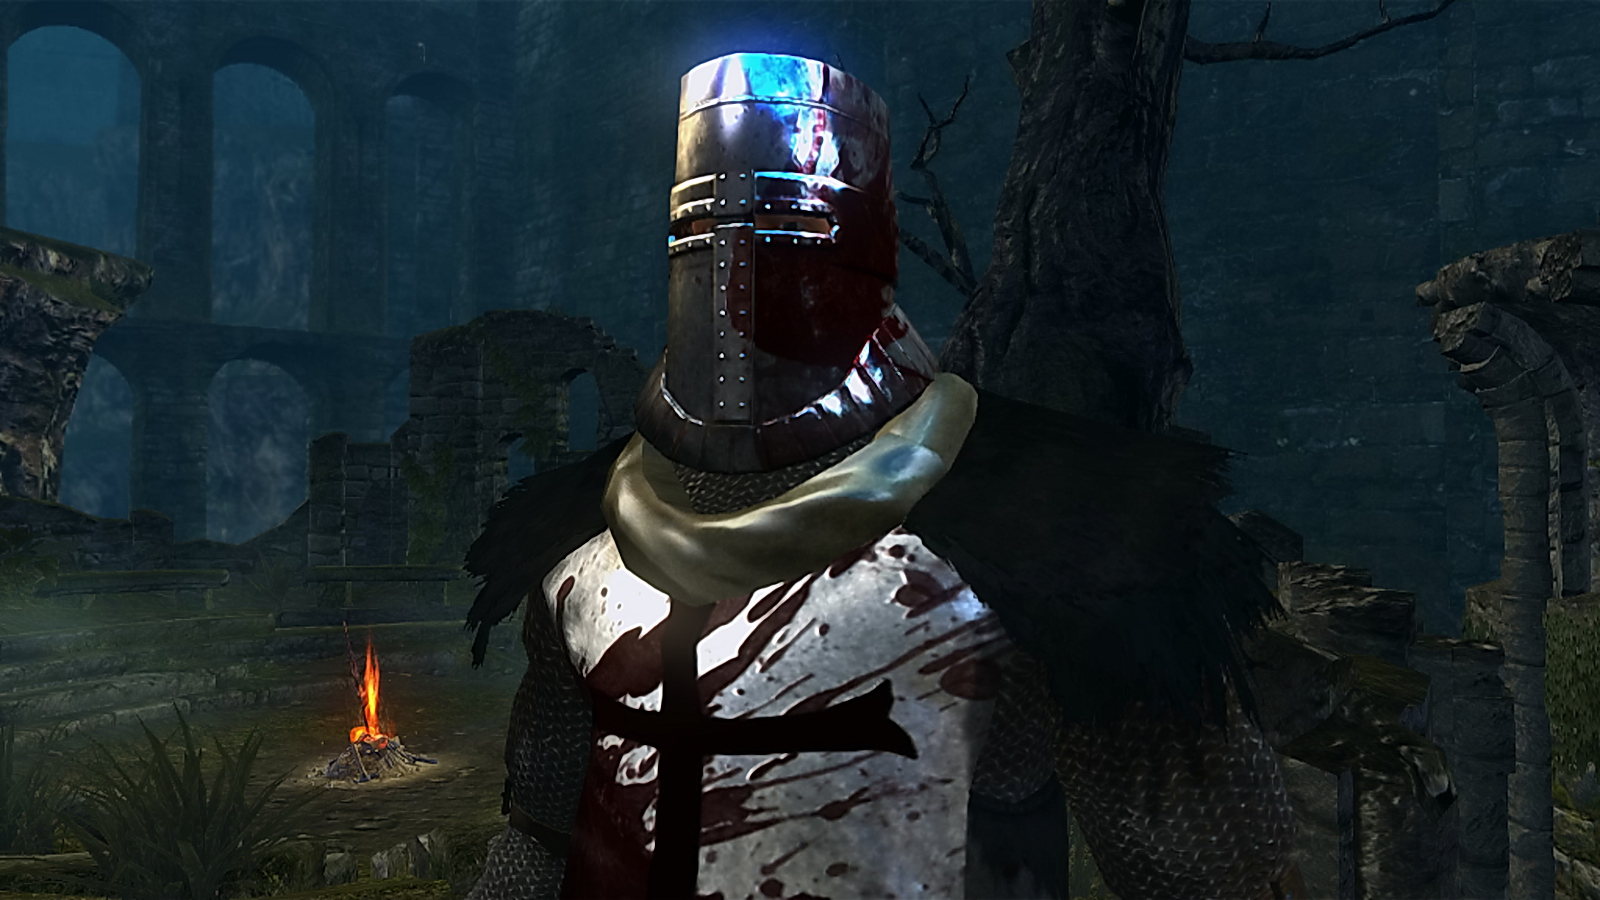 Dark Souls 3 Wallpaper Quote Templar Knight At Dark Souls Nexus Mods And Community